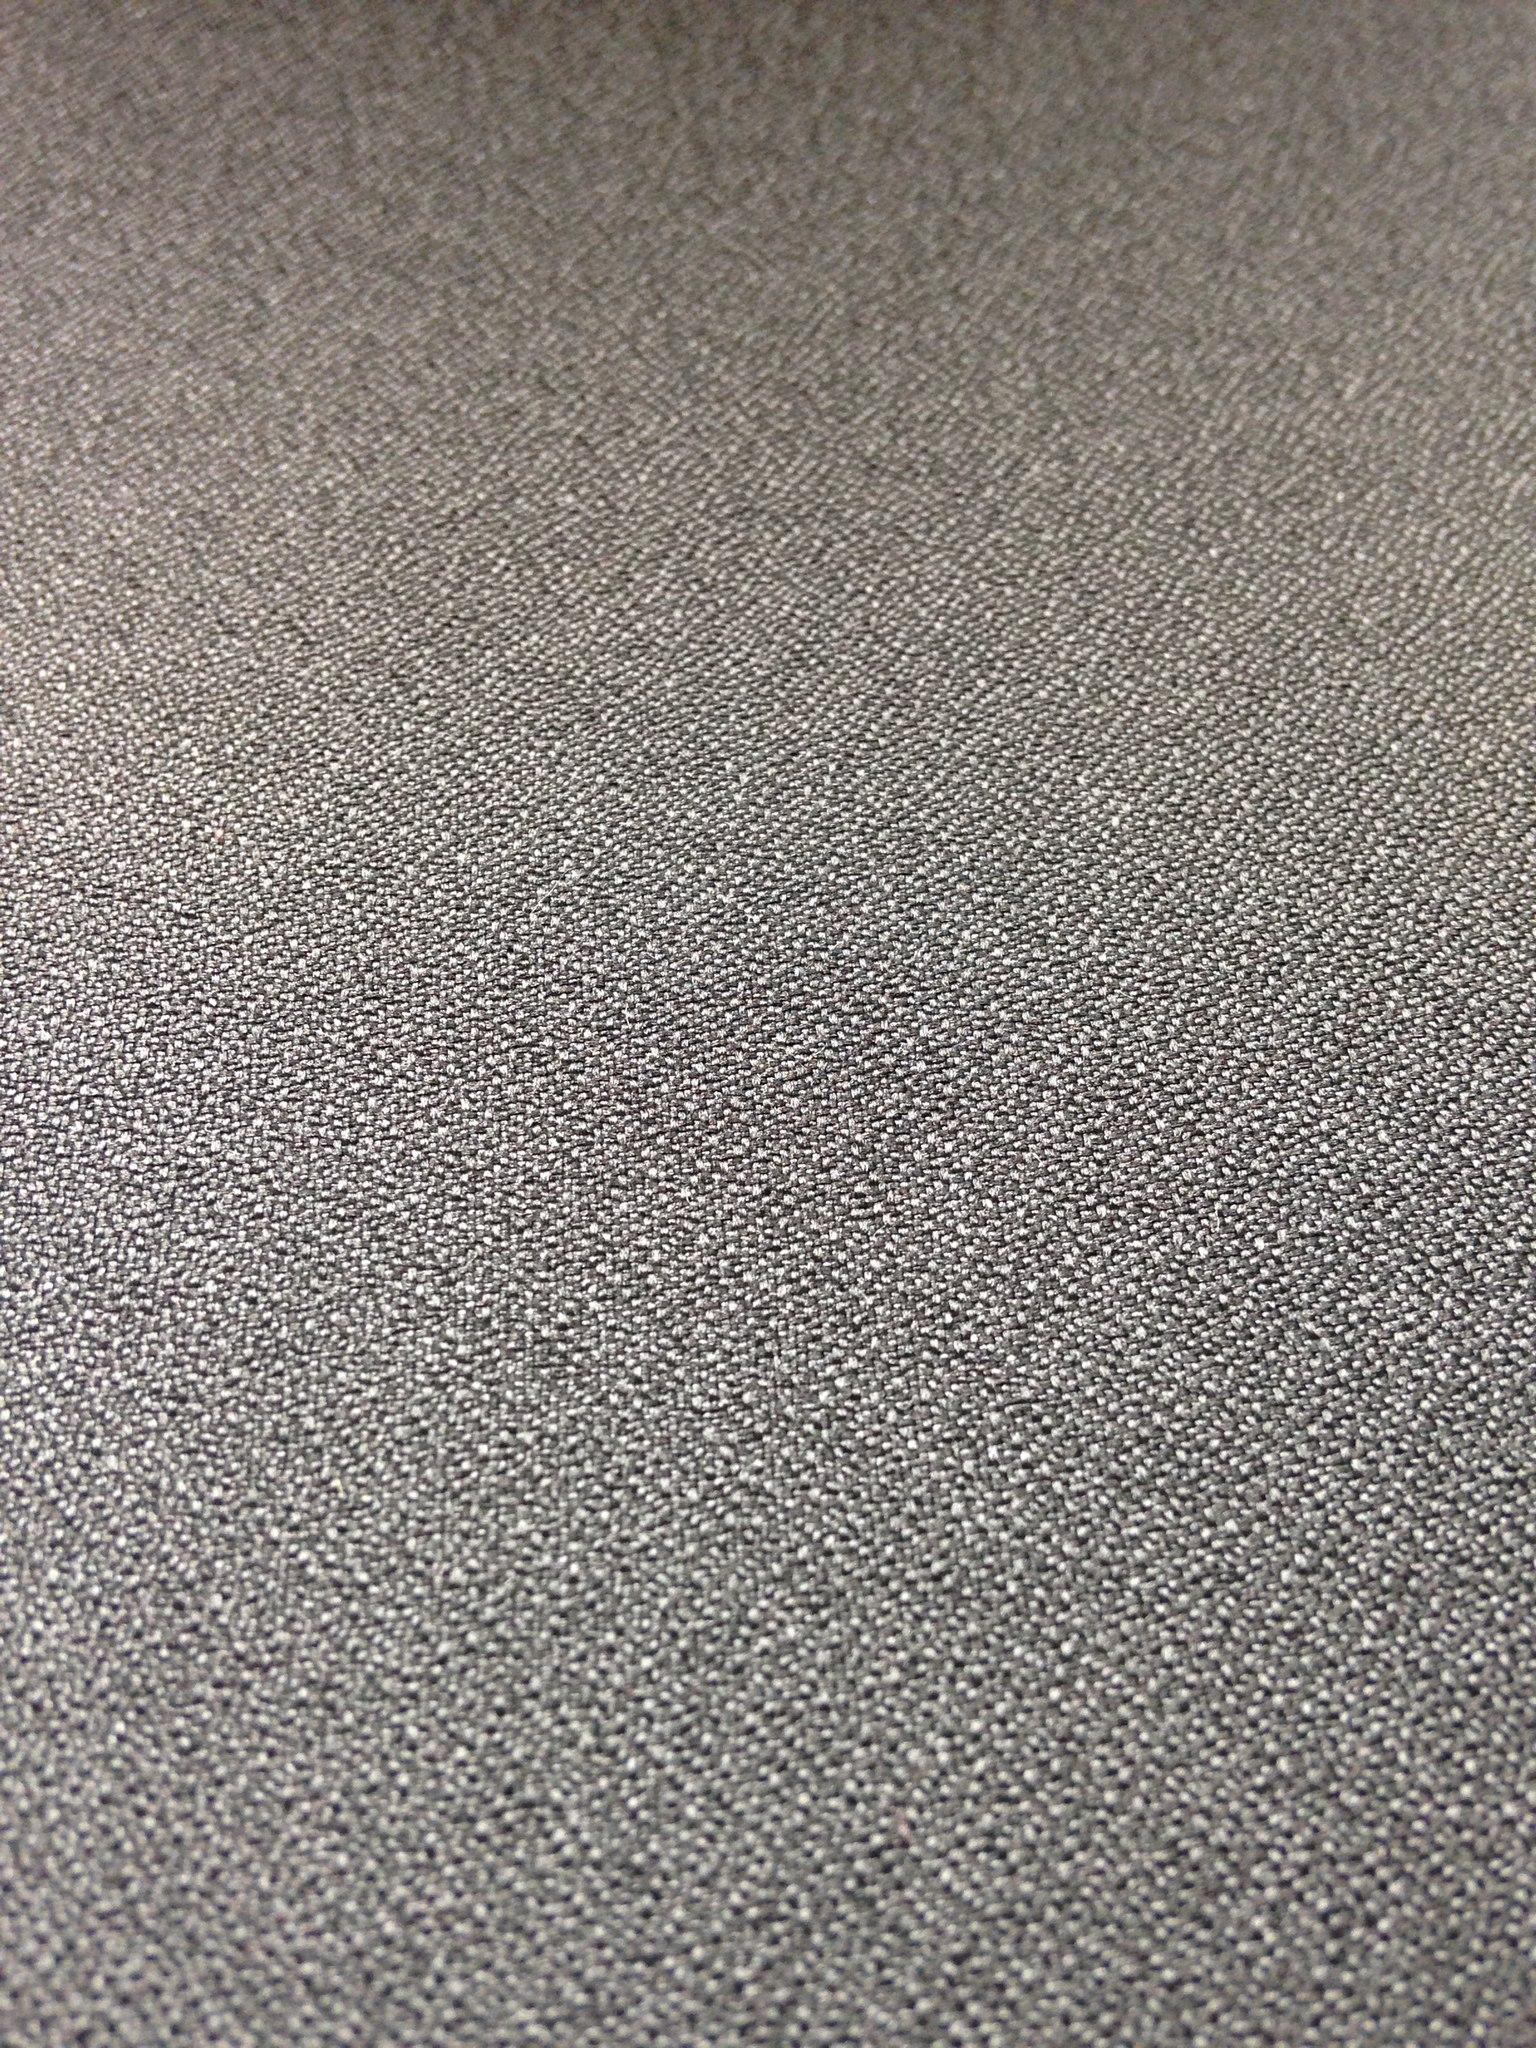 artisam hien gaming mousepad